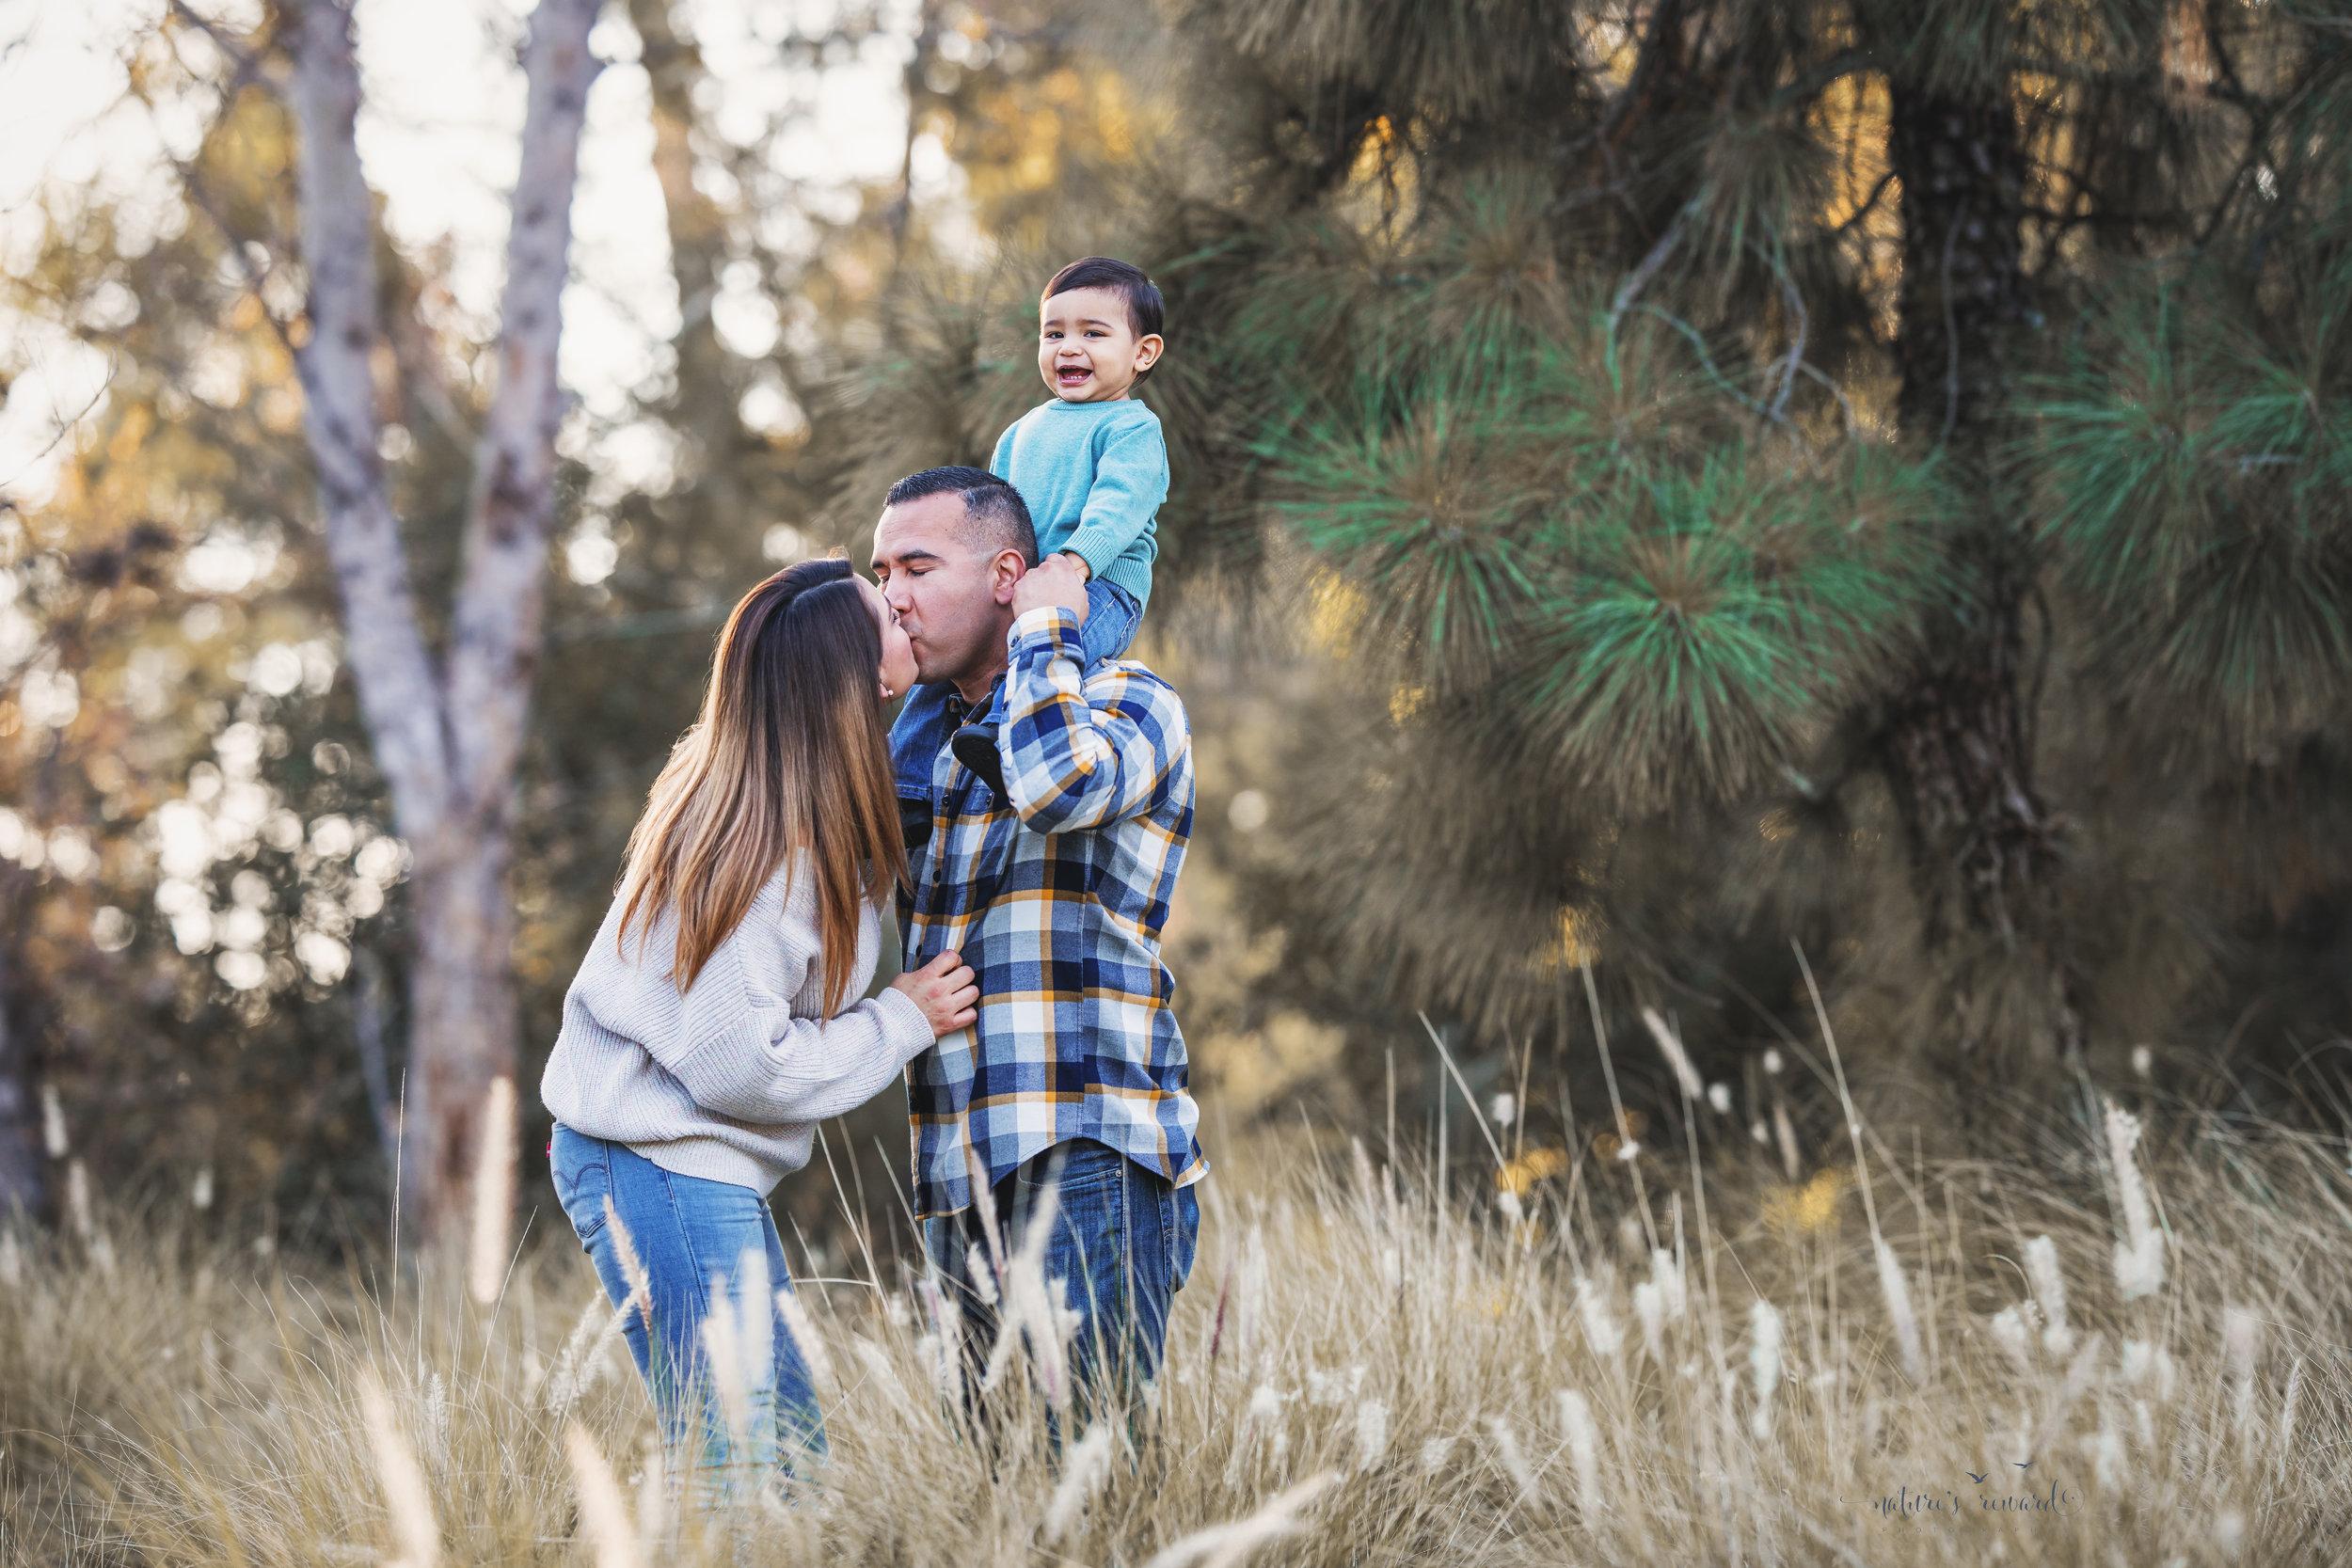 Gorgeous family portrait by Nature's Reward photography